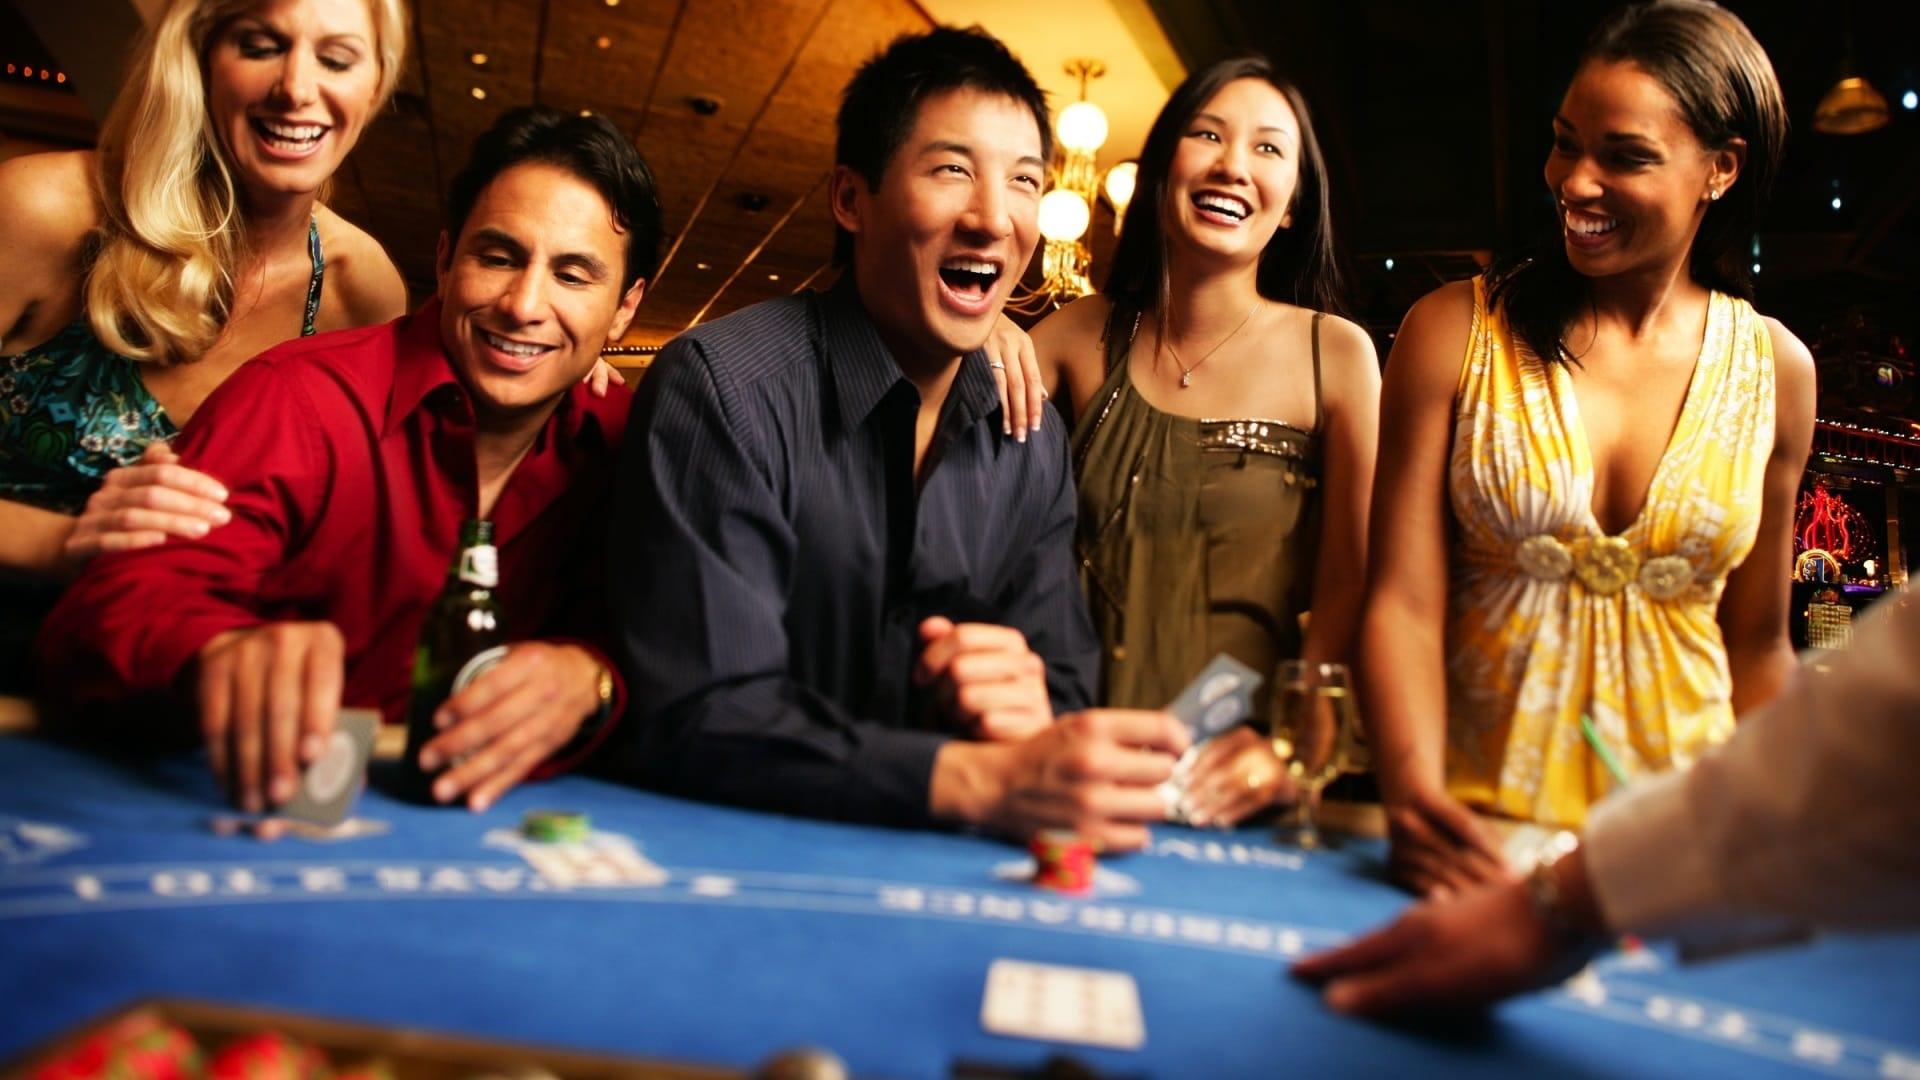 Basics of Online Casino Gaming for Beginners